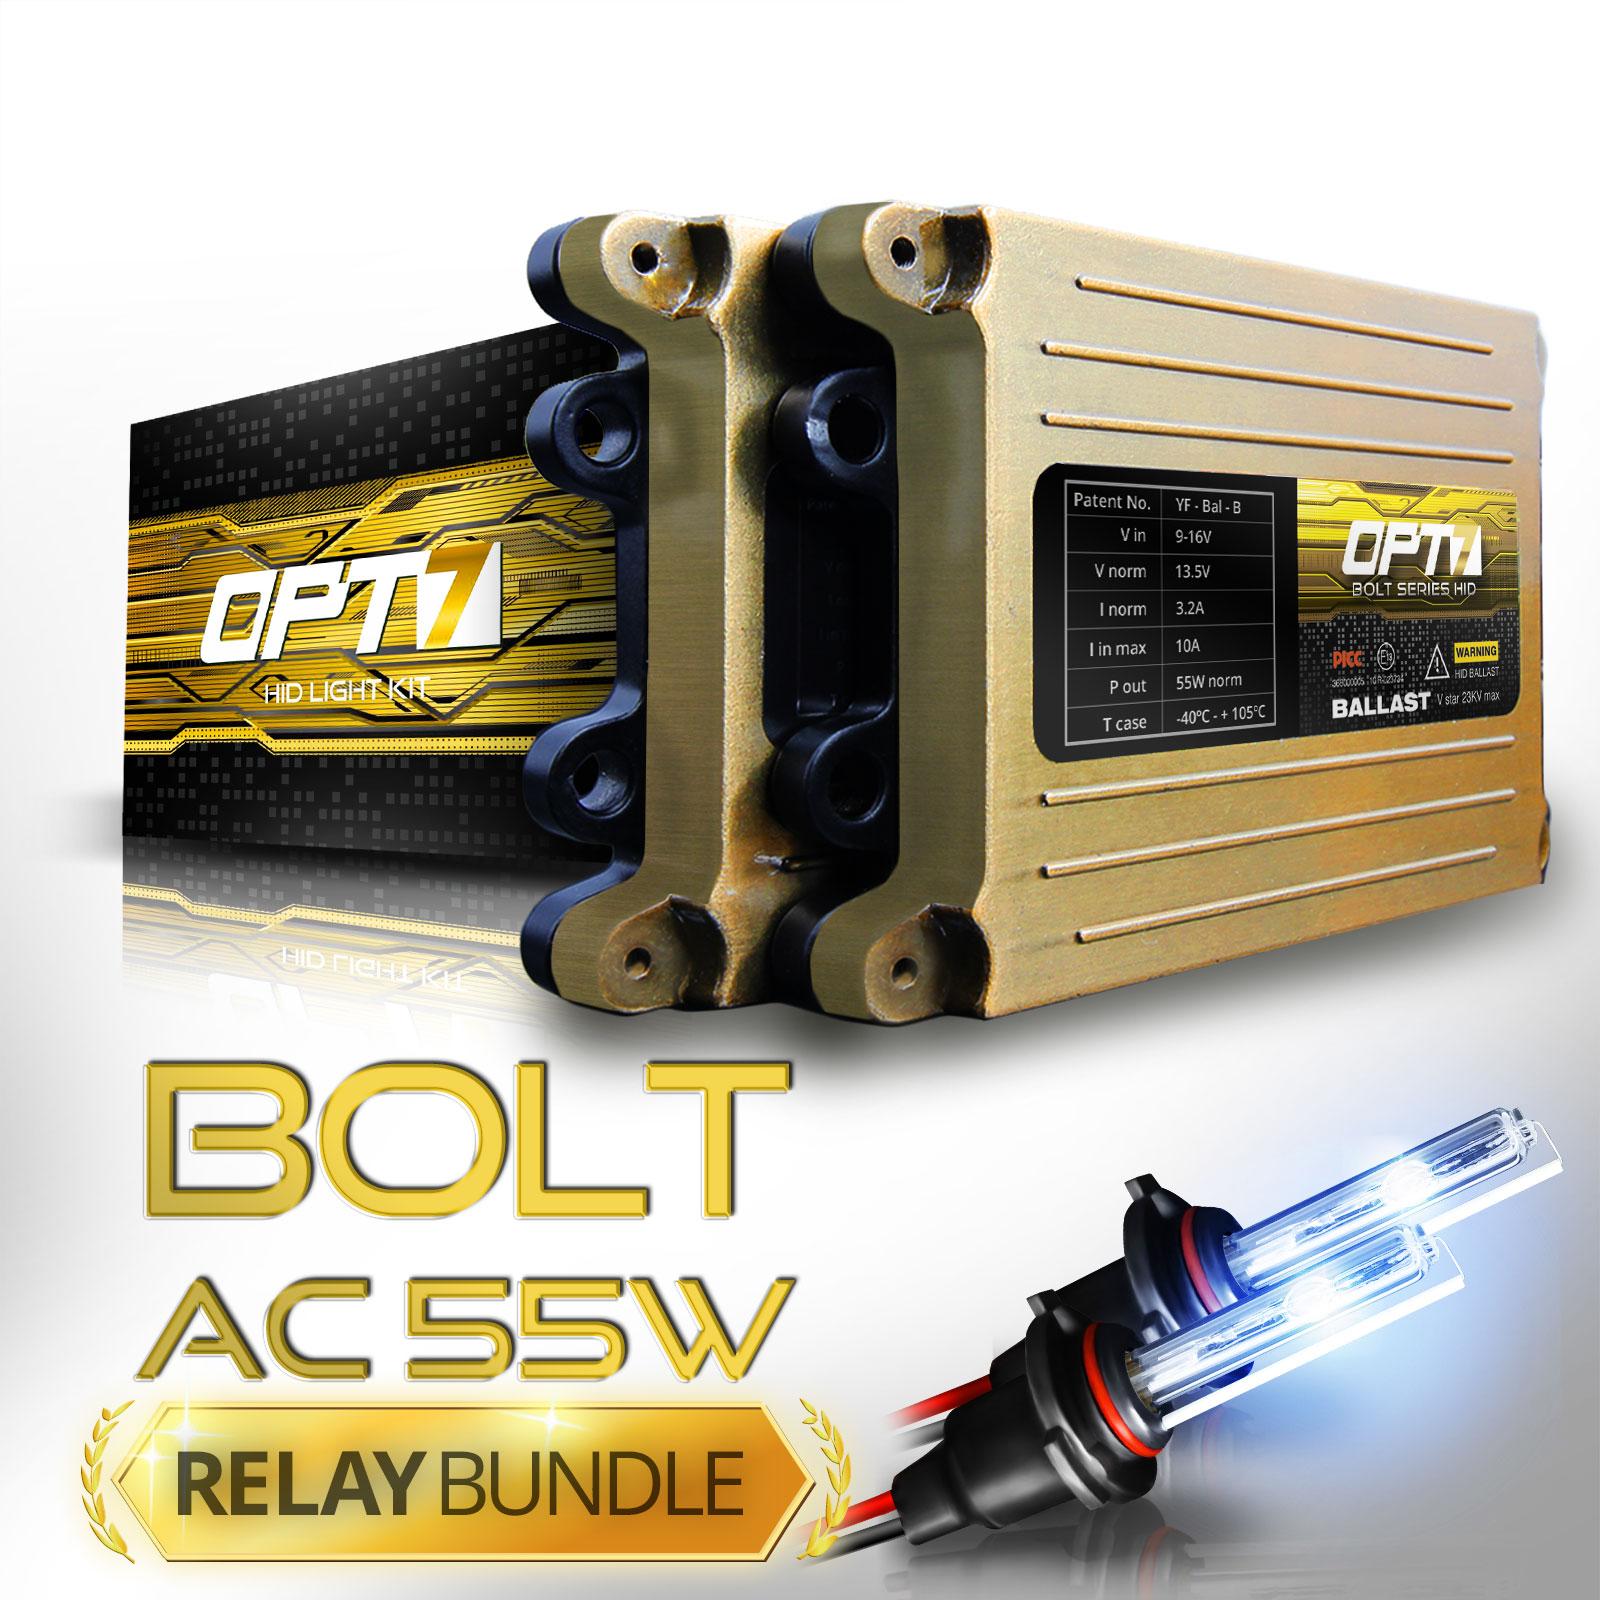 Bolt AC 55w HID Xenon Conversion Kit w/ Relay & Capacitors Bundle H11 [6000K Lightning Blue] 2 Yr Warranty